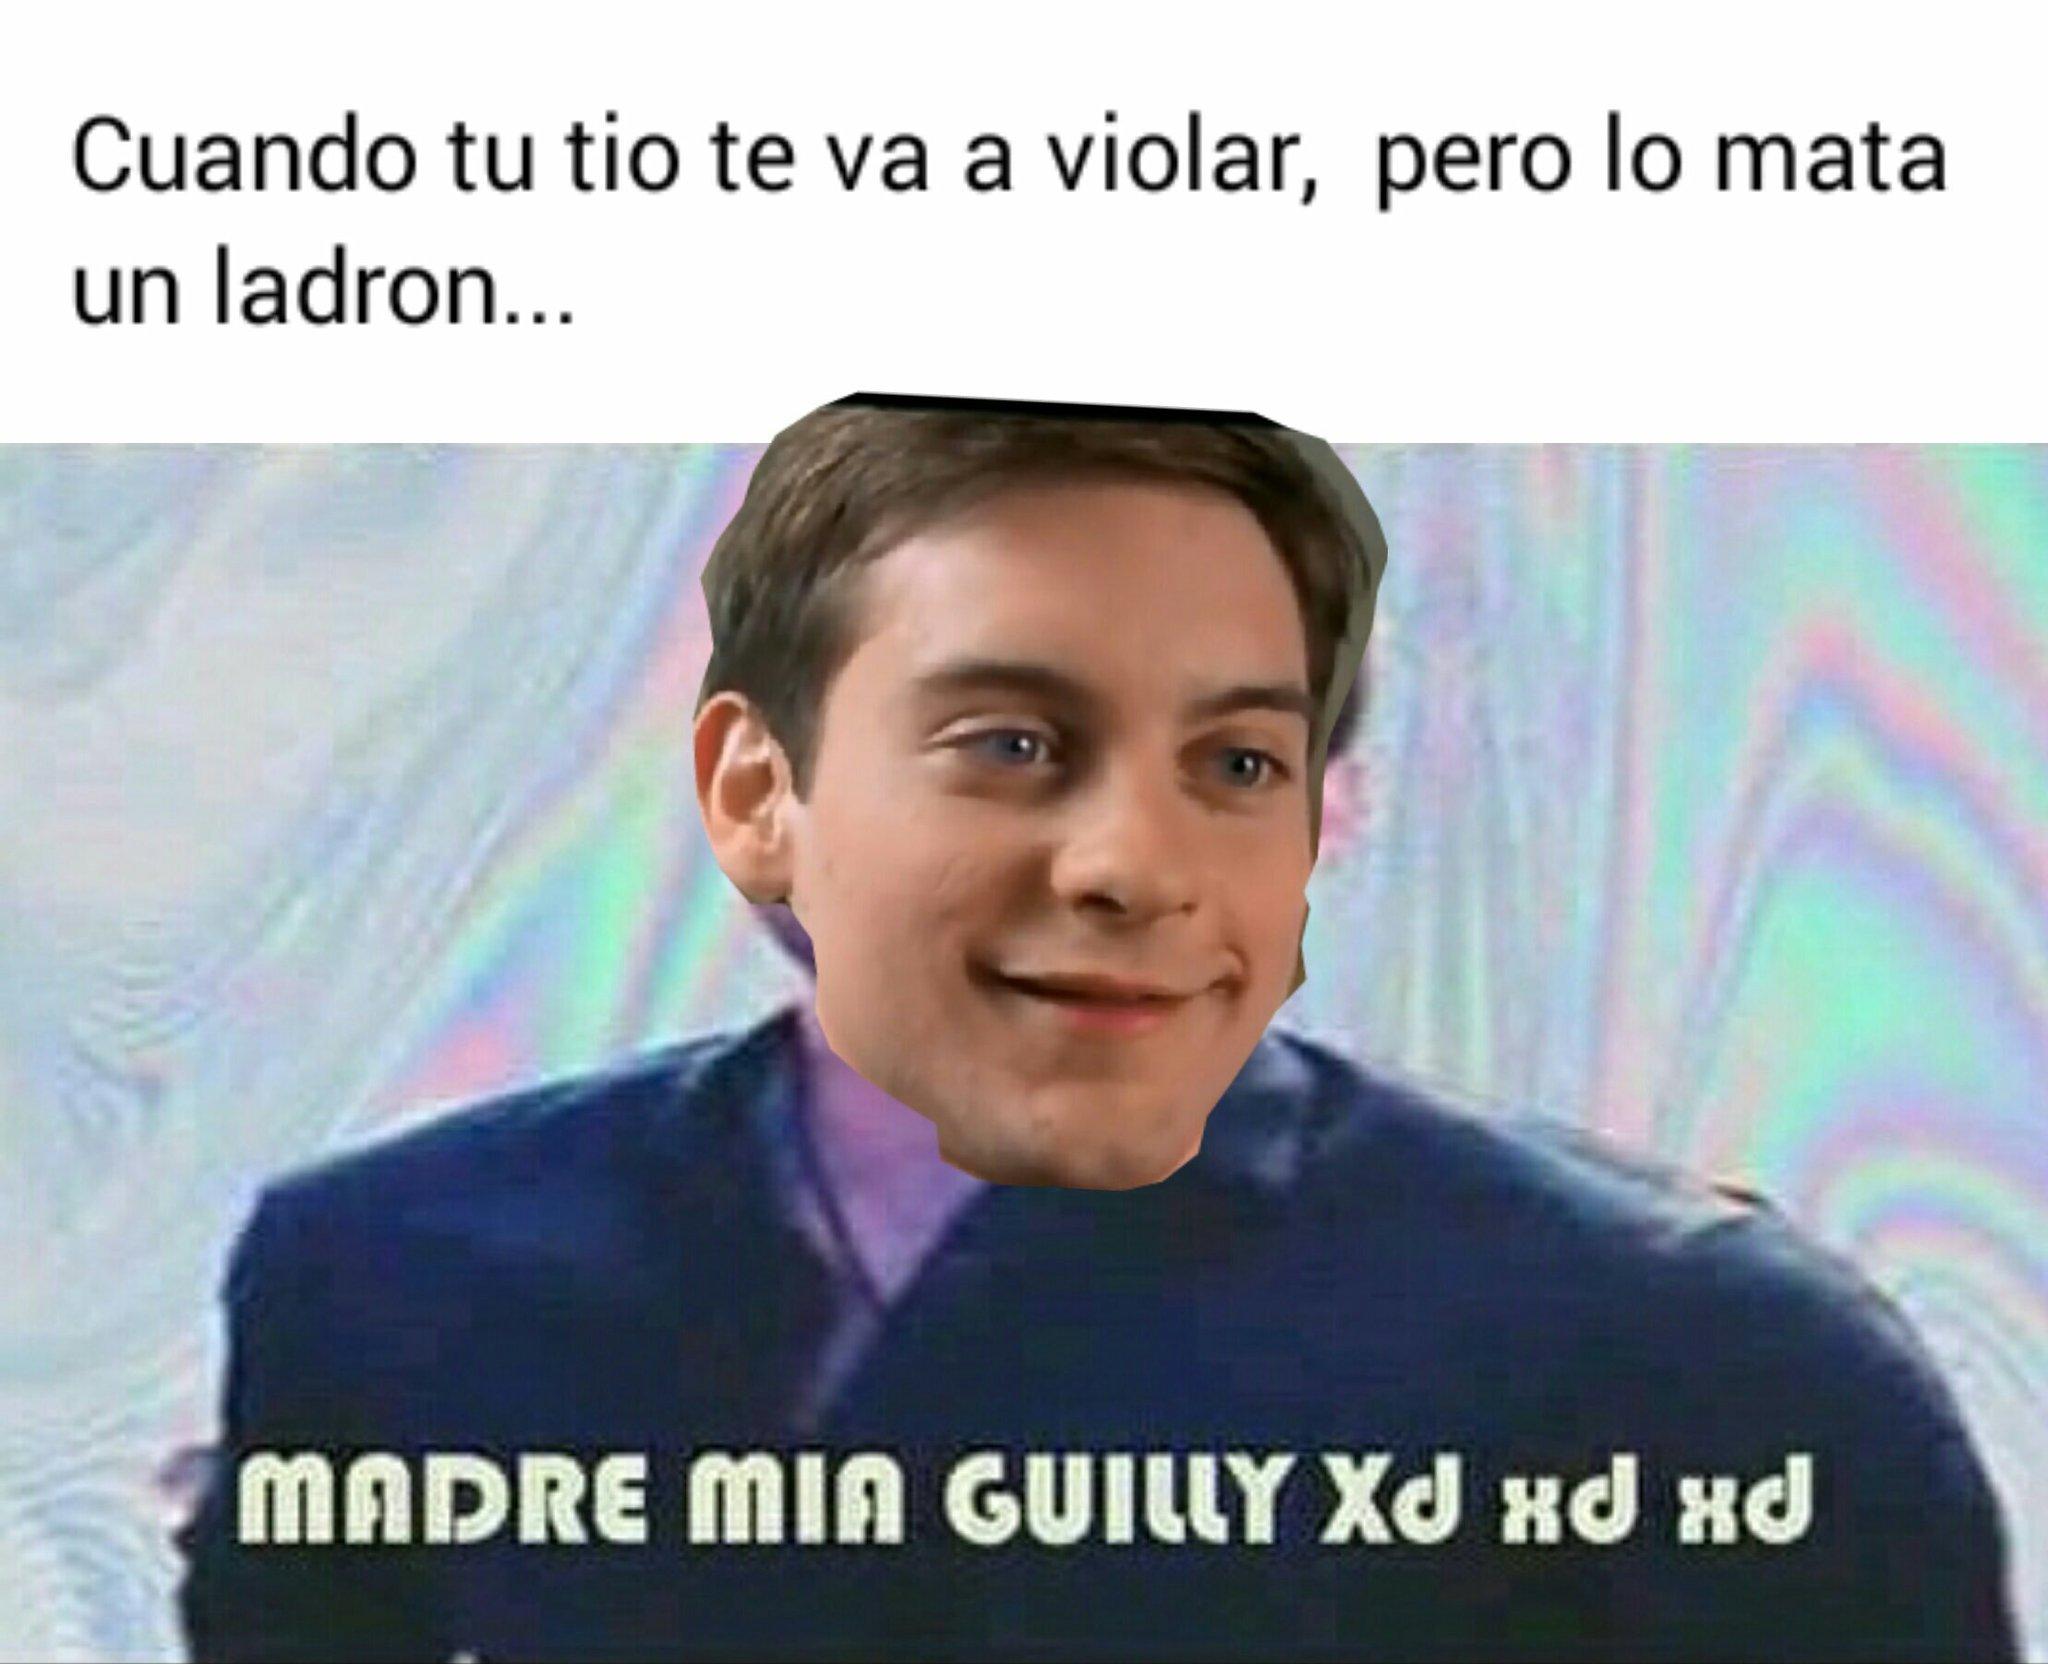 Madre mia Ben XdXXdDdDXD - meme